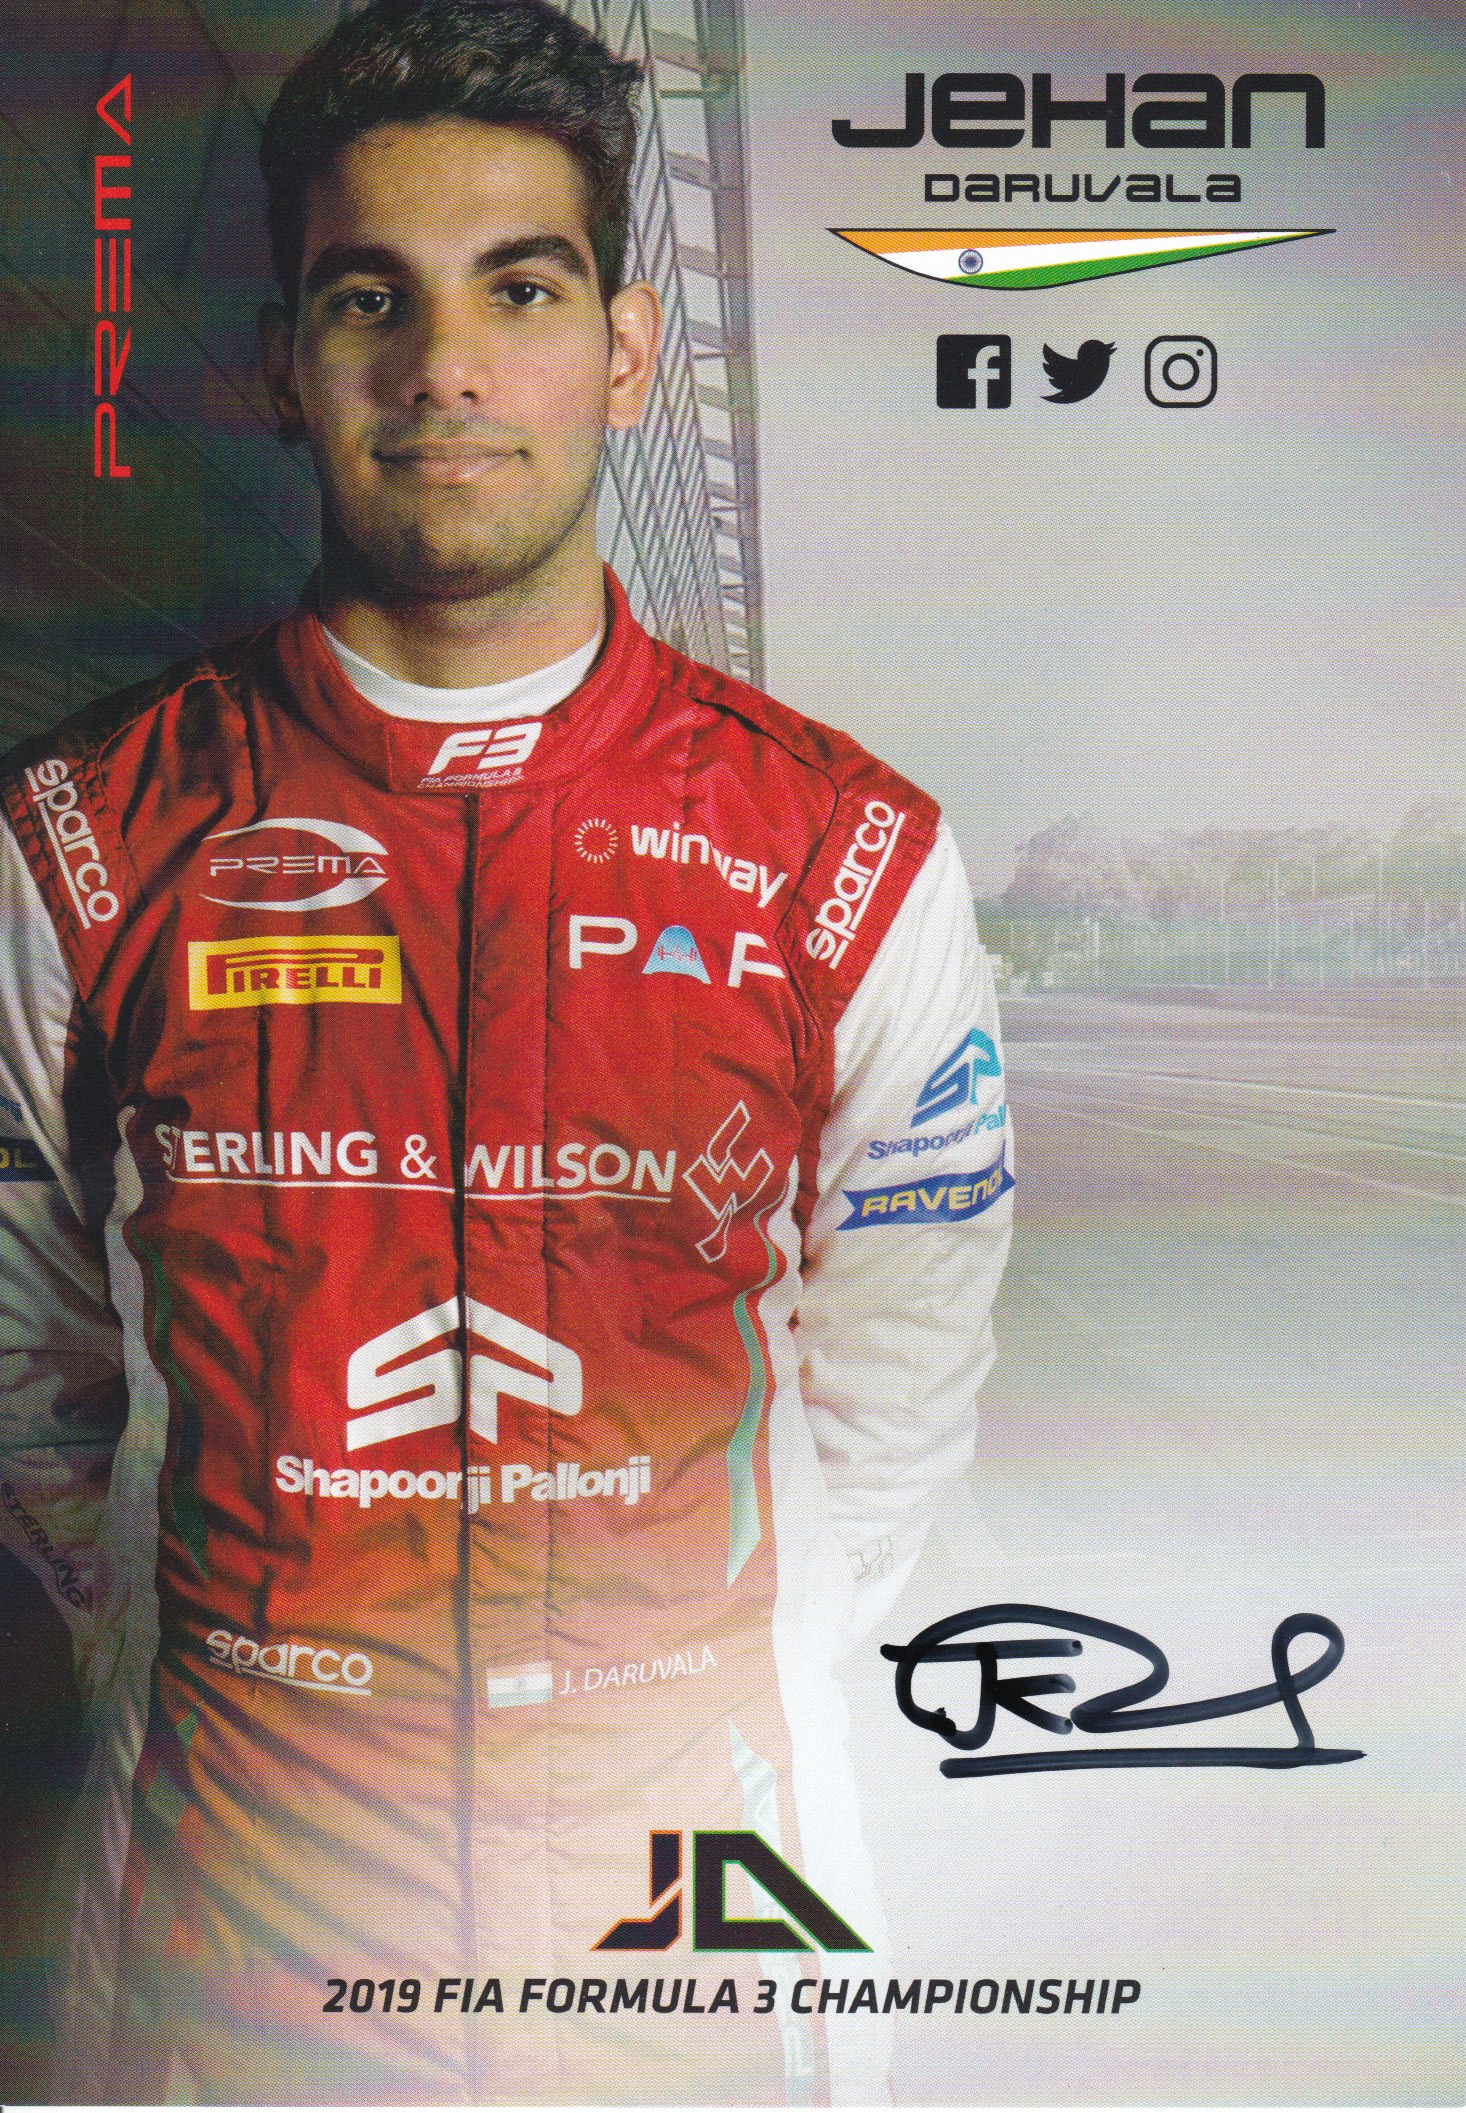 Jehan Daruvala Prema Powerteam 2019